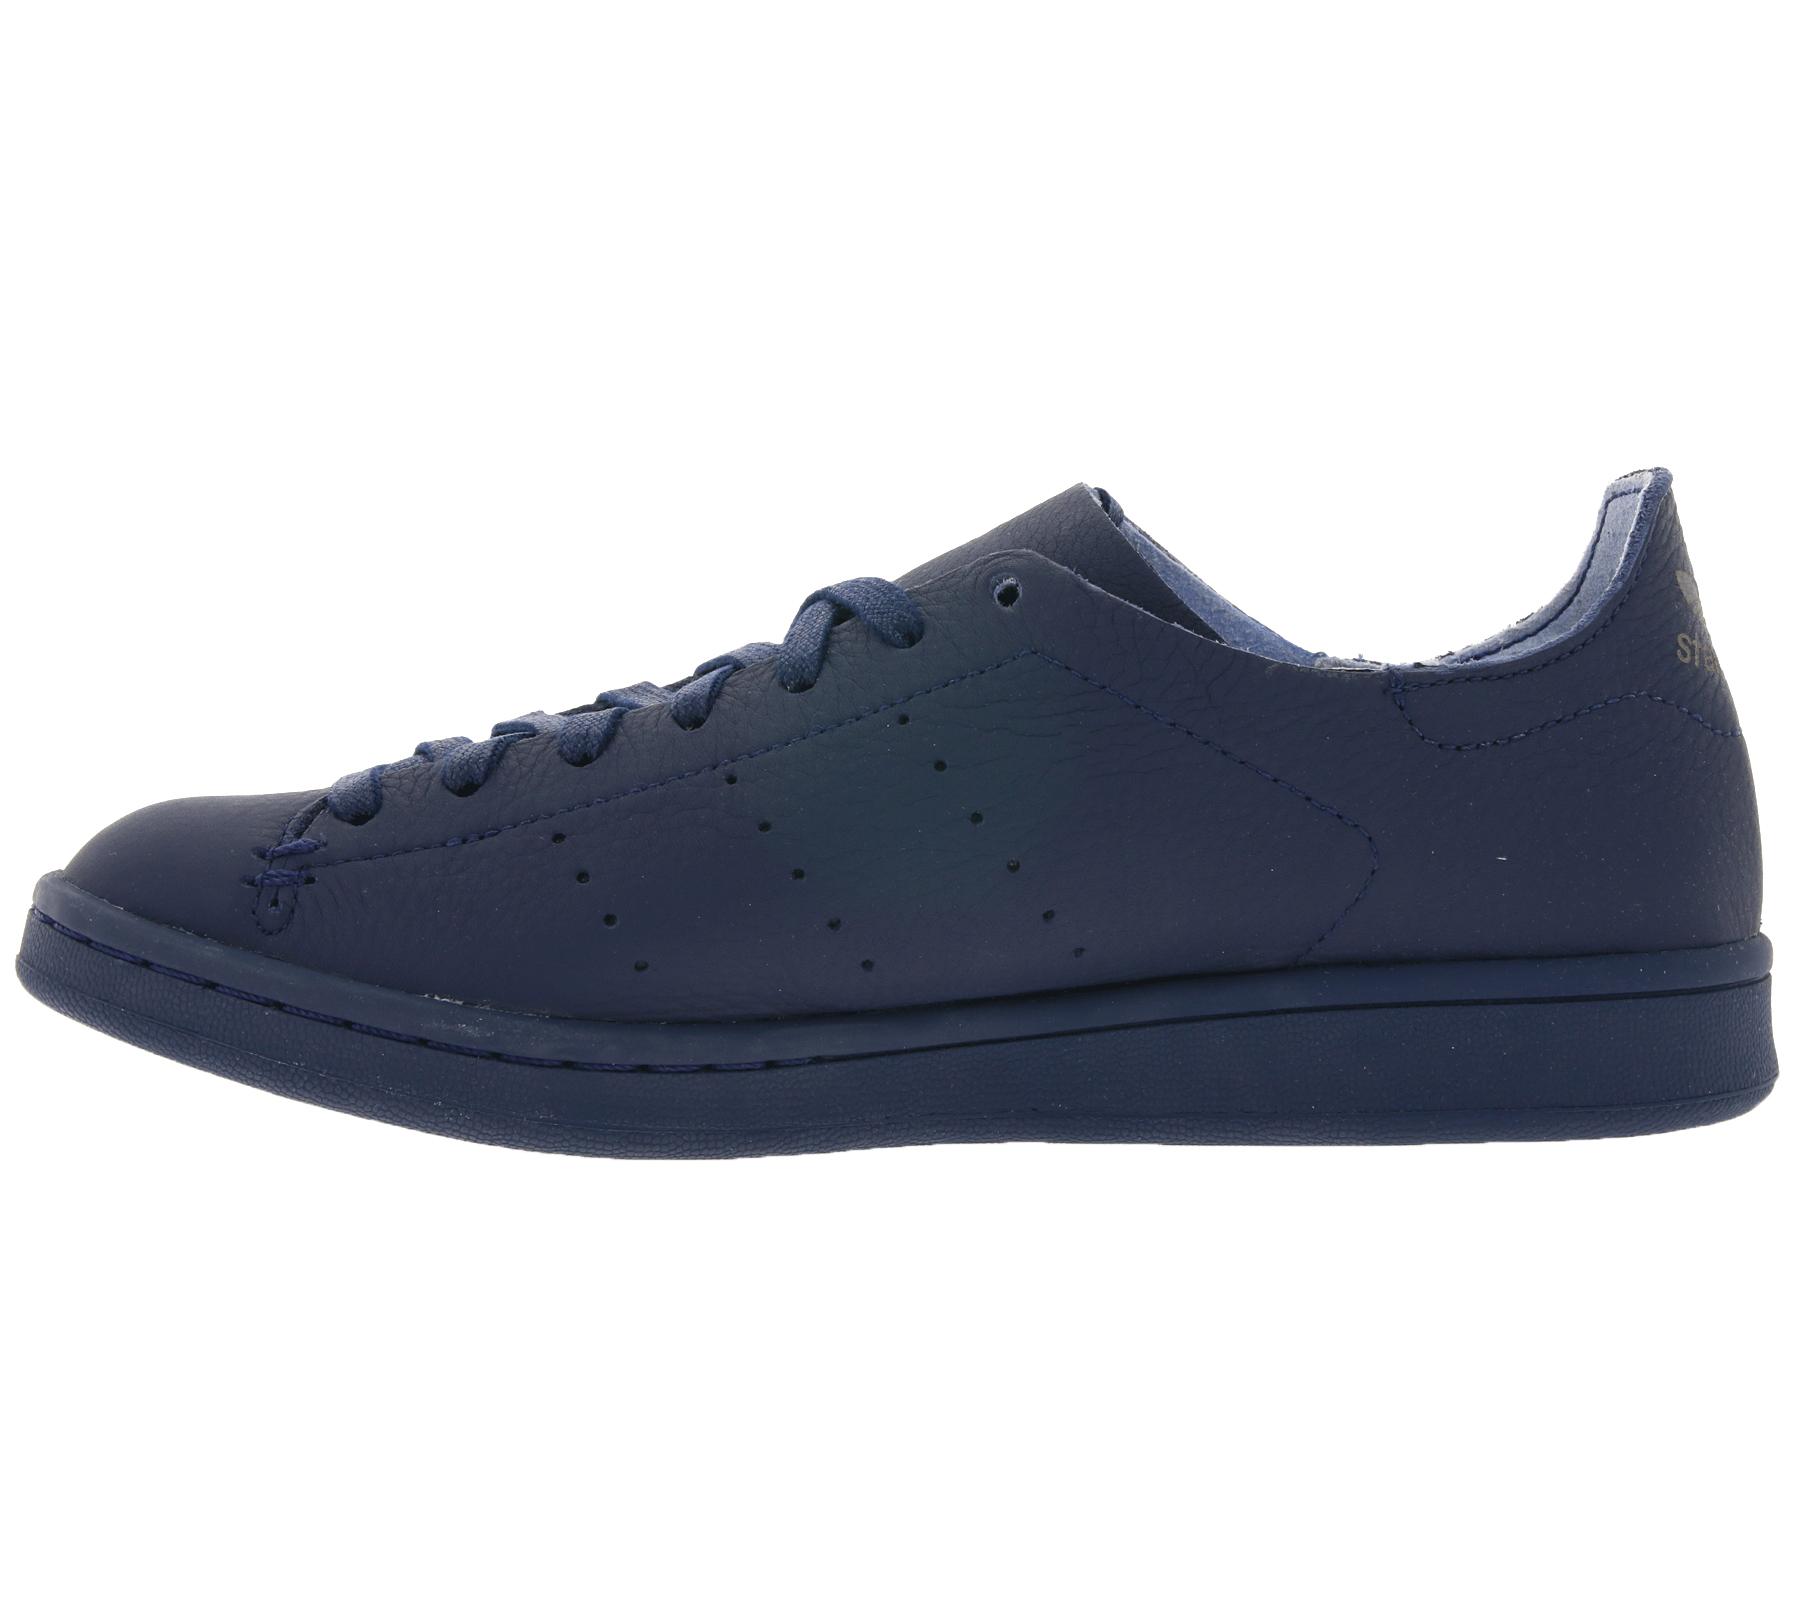 finest selection eae06 ccf8c adidas Women's Sneaker Original Stan Smith Lea Sock Genuine Leather Shoes  Blue